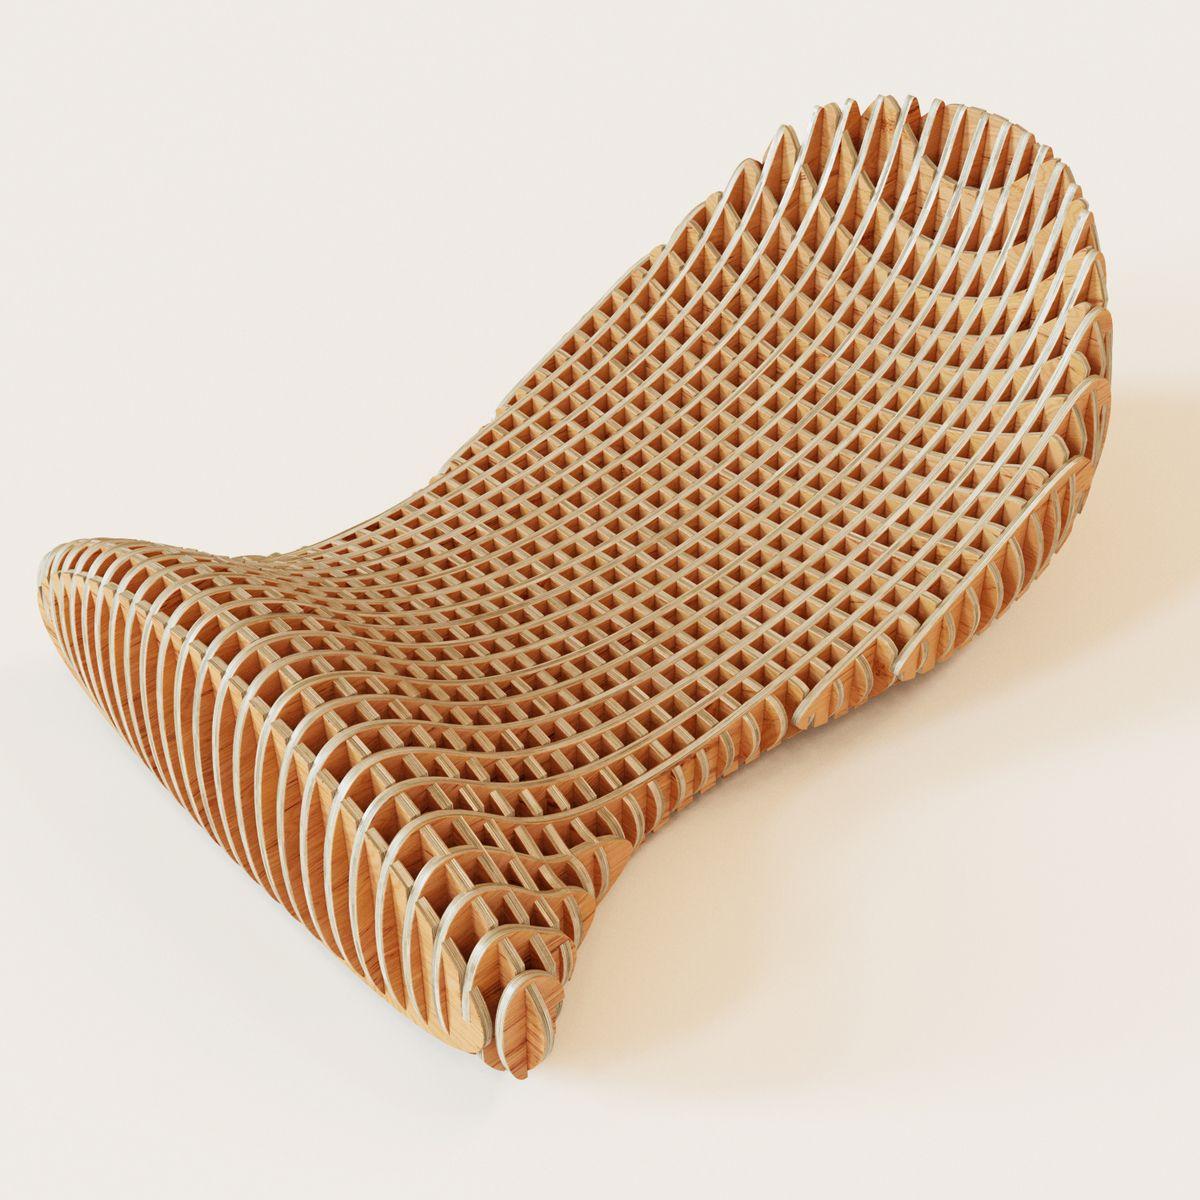 3D Model Parametric Bench Twinpea | Outdoor Furniture 3D Models | Beskor    3D Squirrel